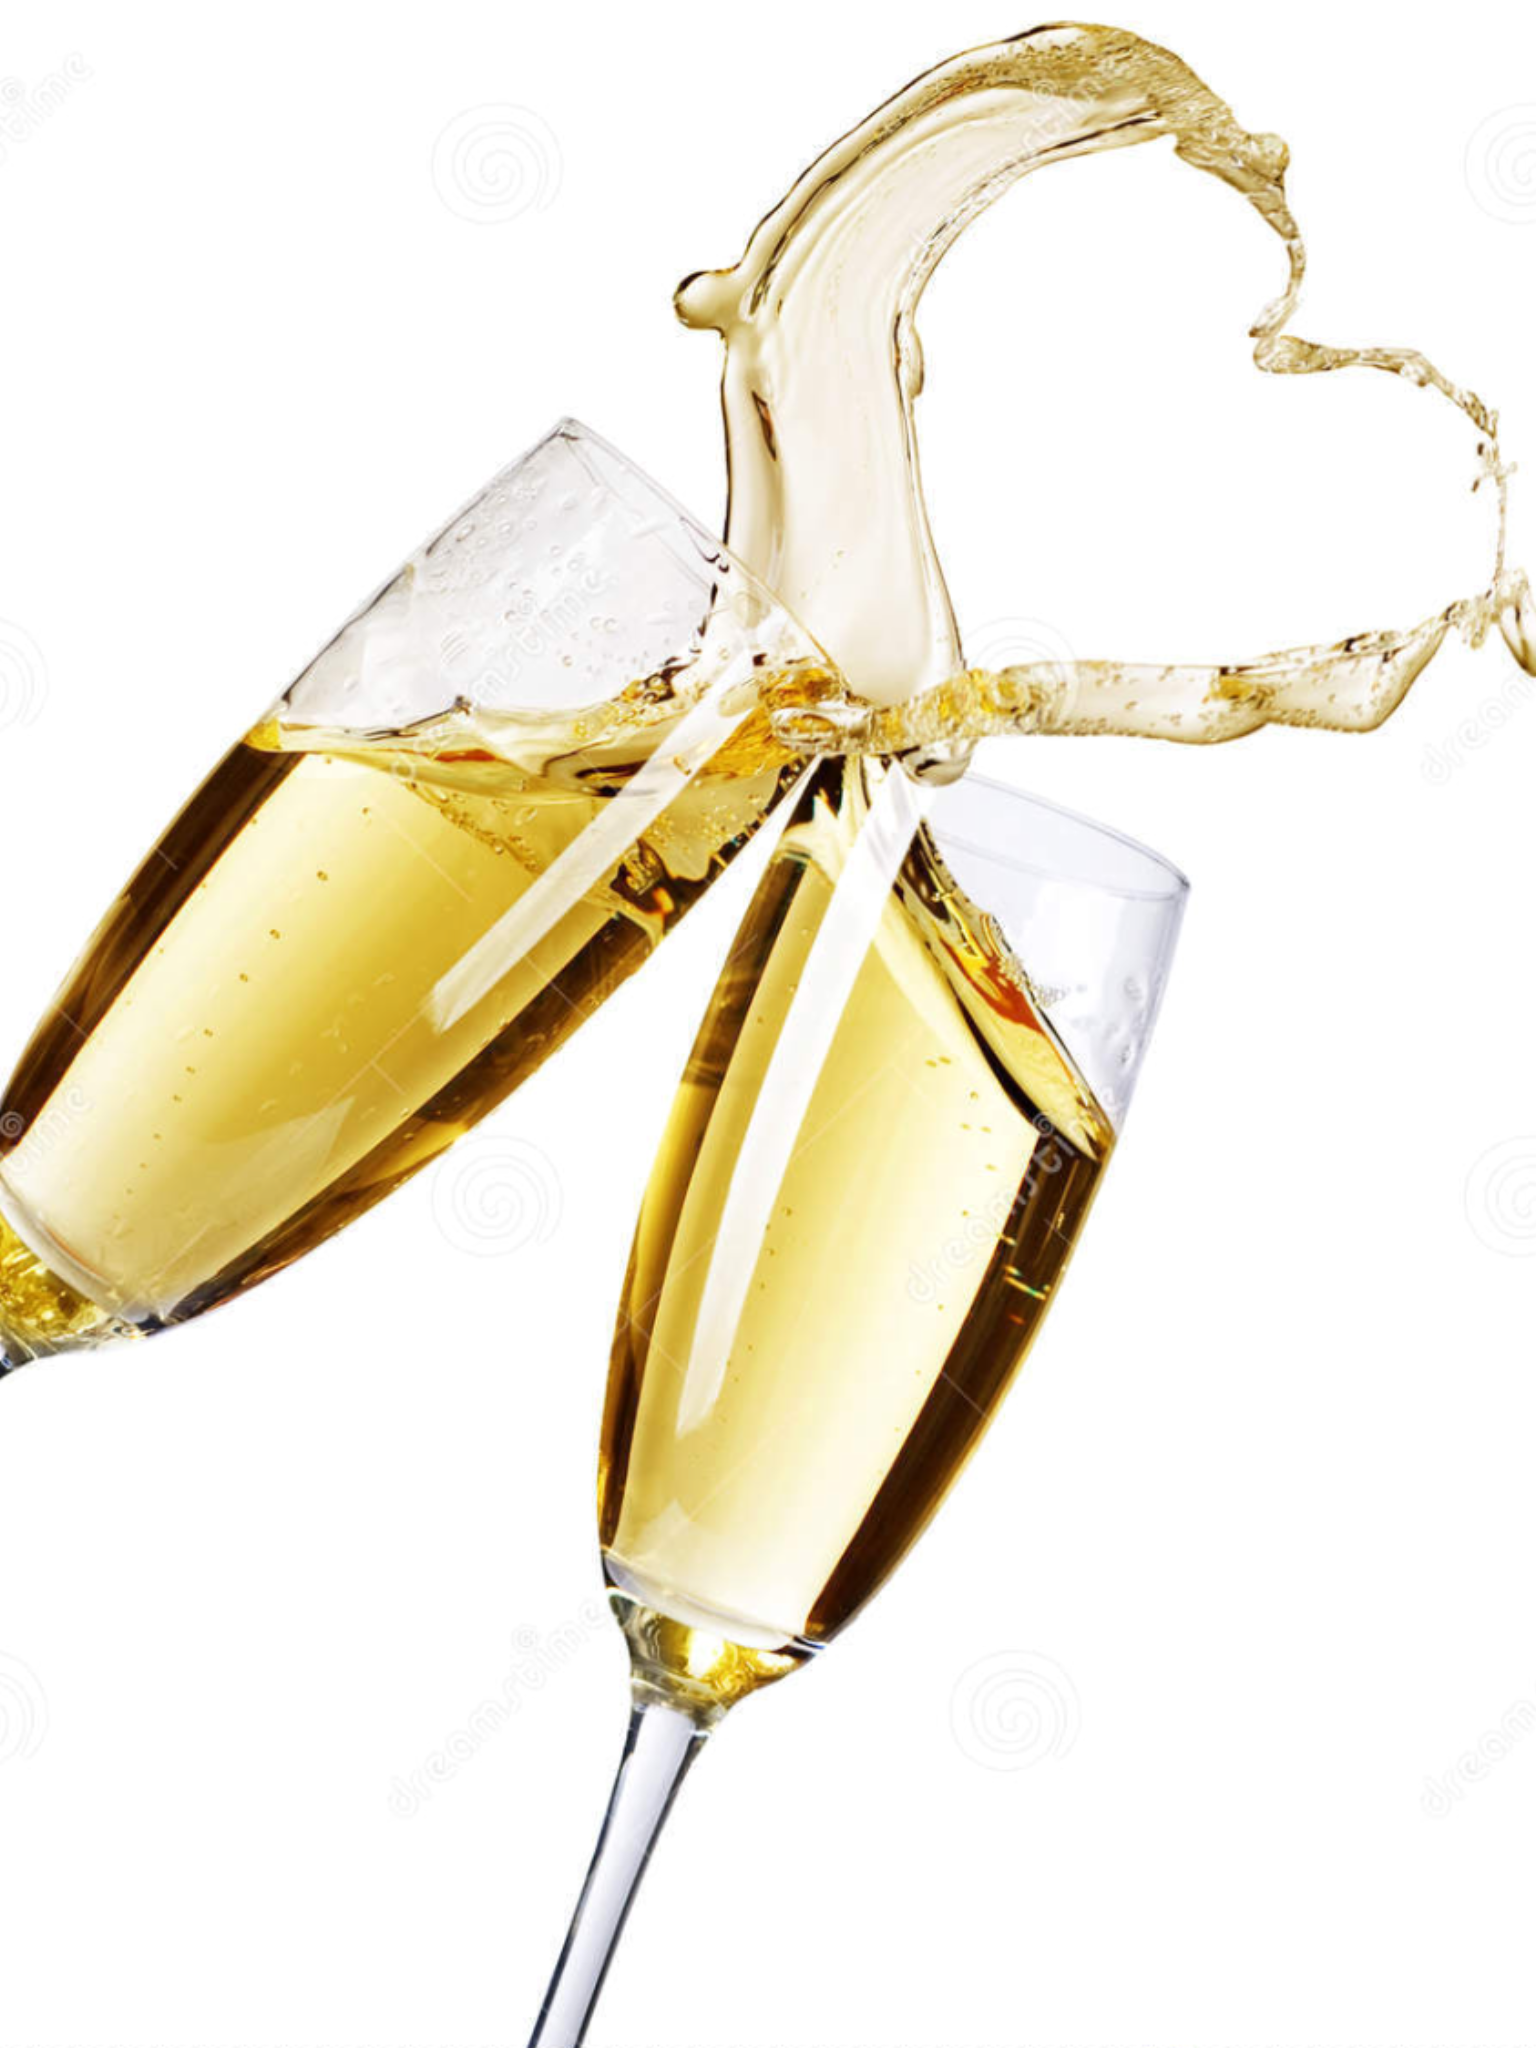 Pin By Pauline Shiro Mungai On Tiny Bubbles Champagne Wine Wallpaper Wedding Champagne Glasses